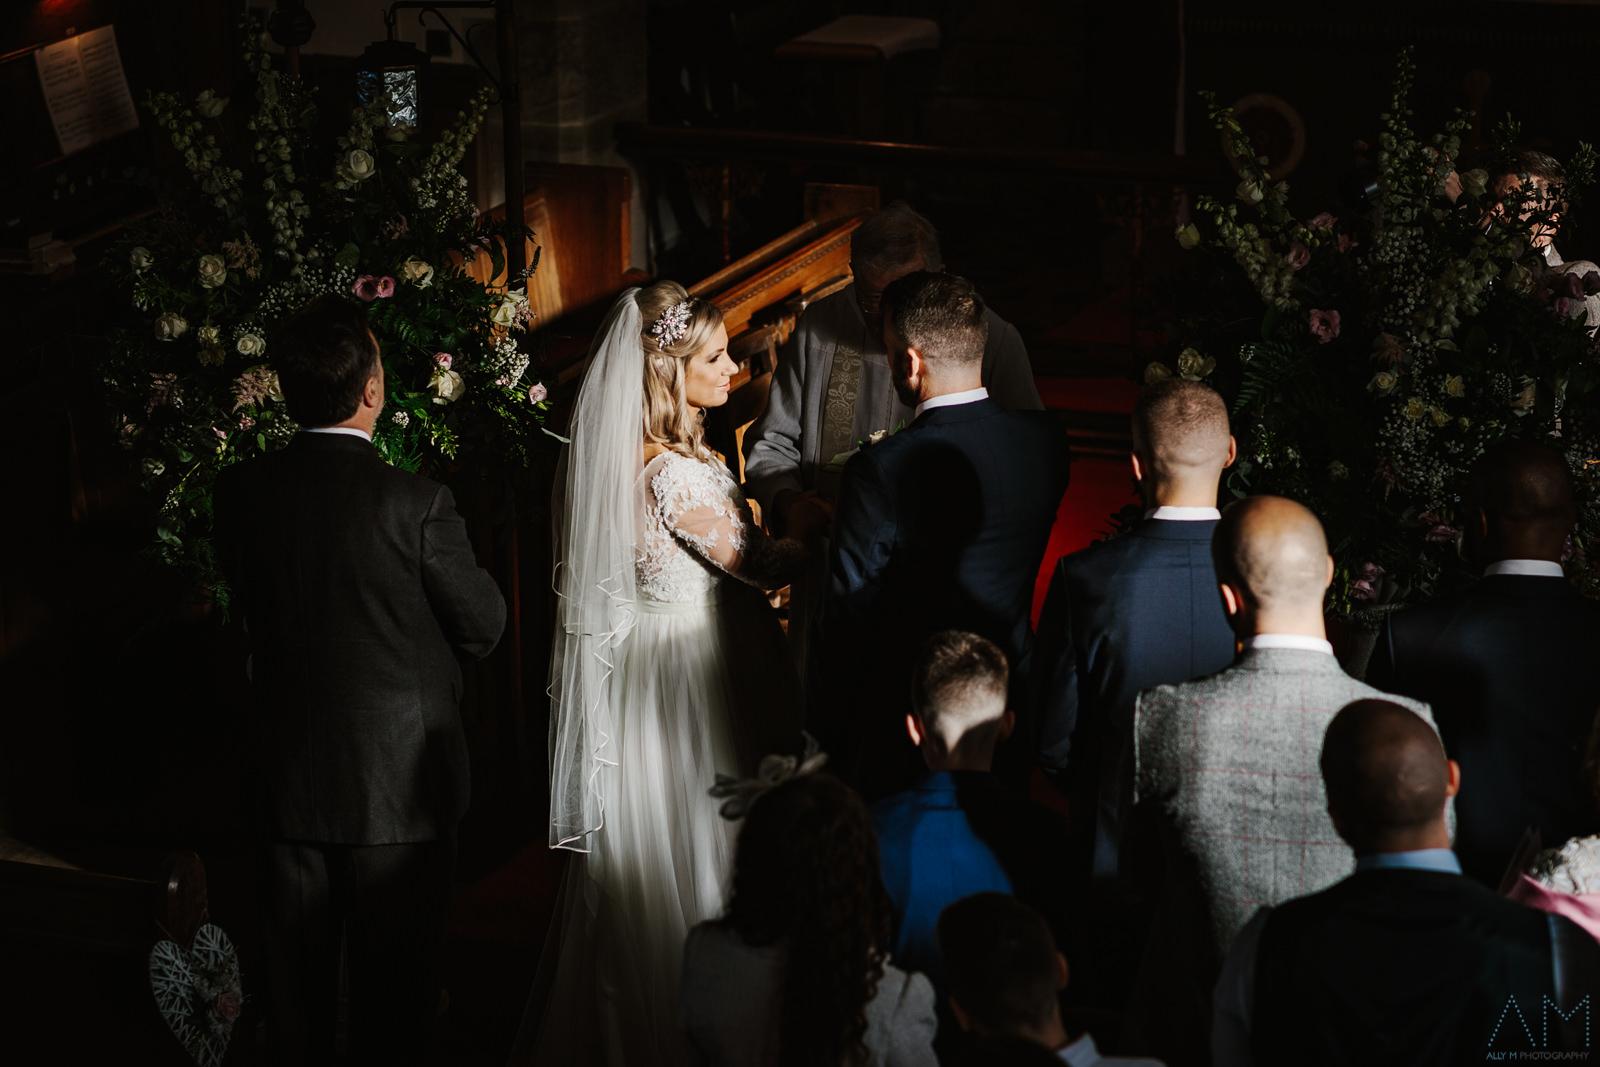 Bride and groom stood in lovely light